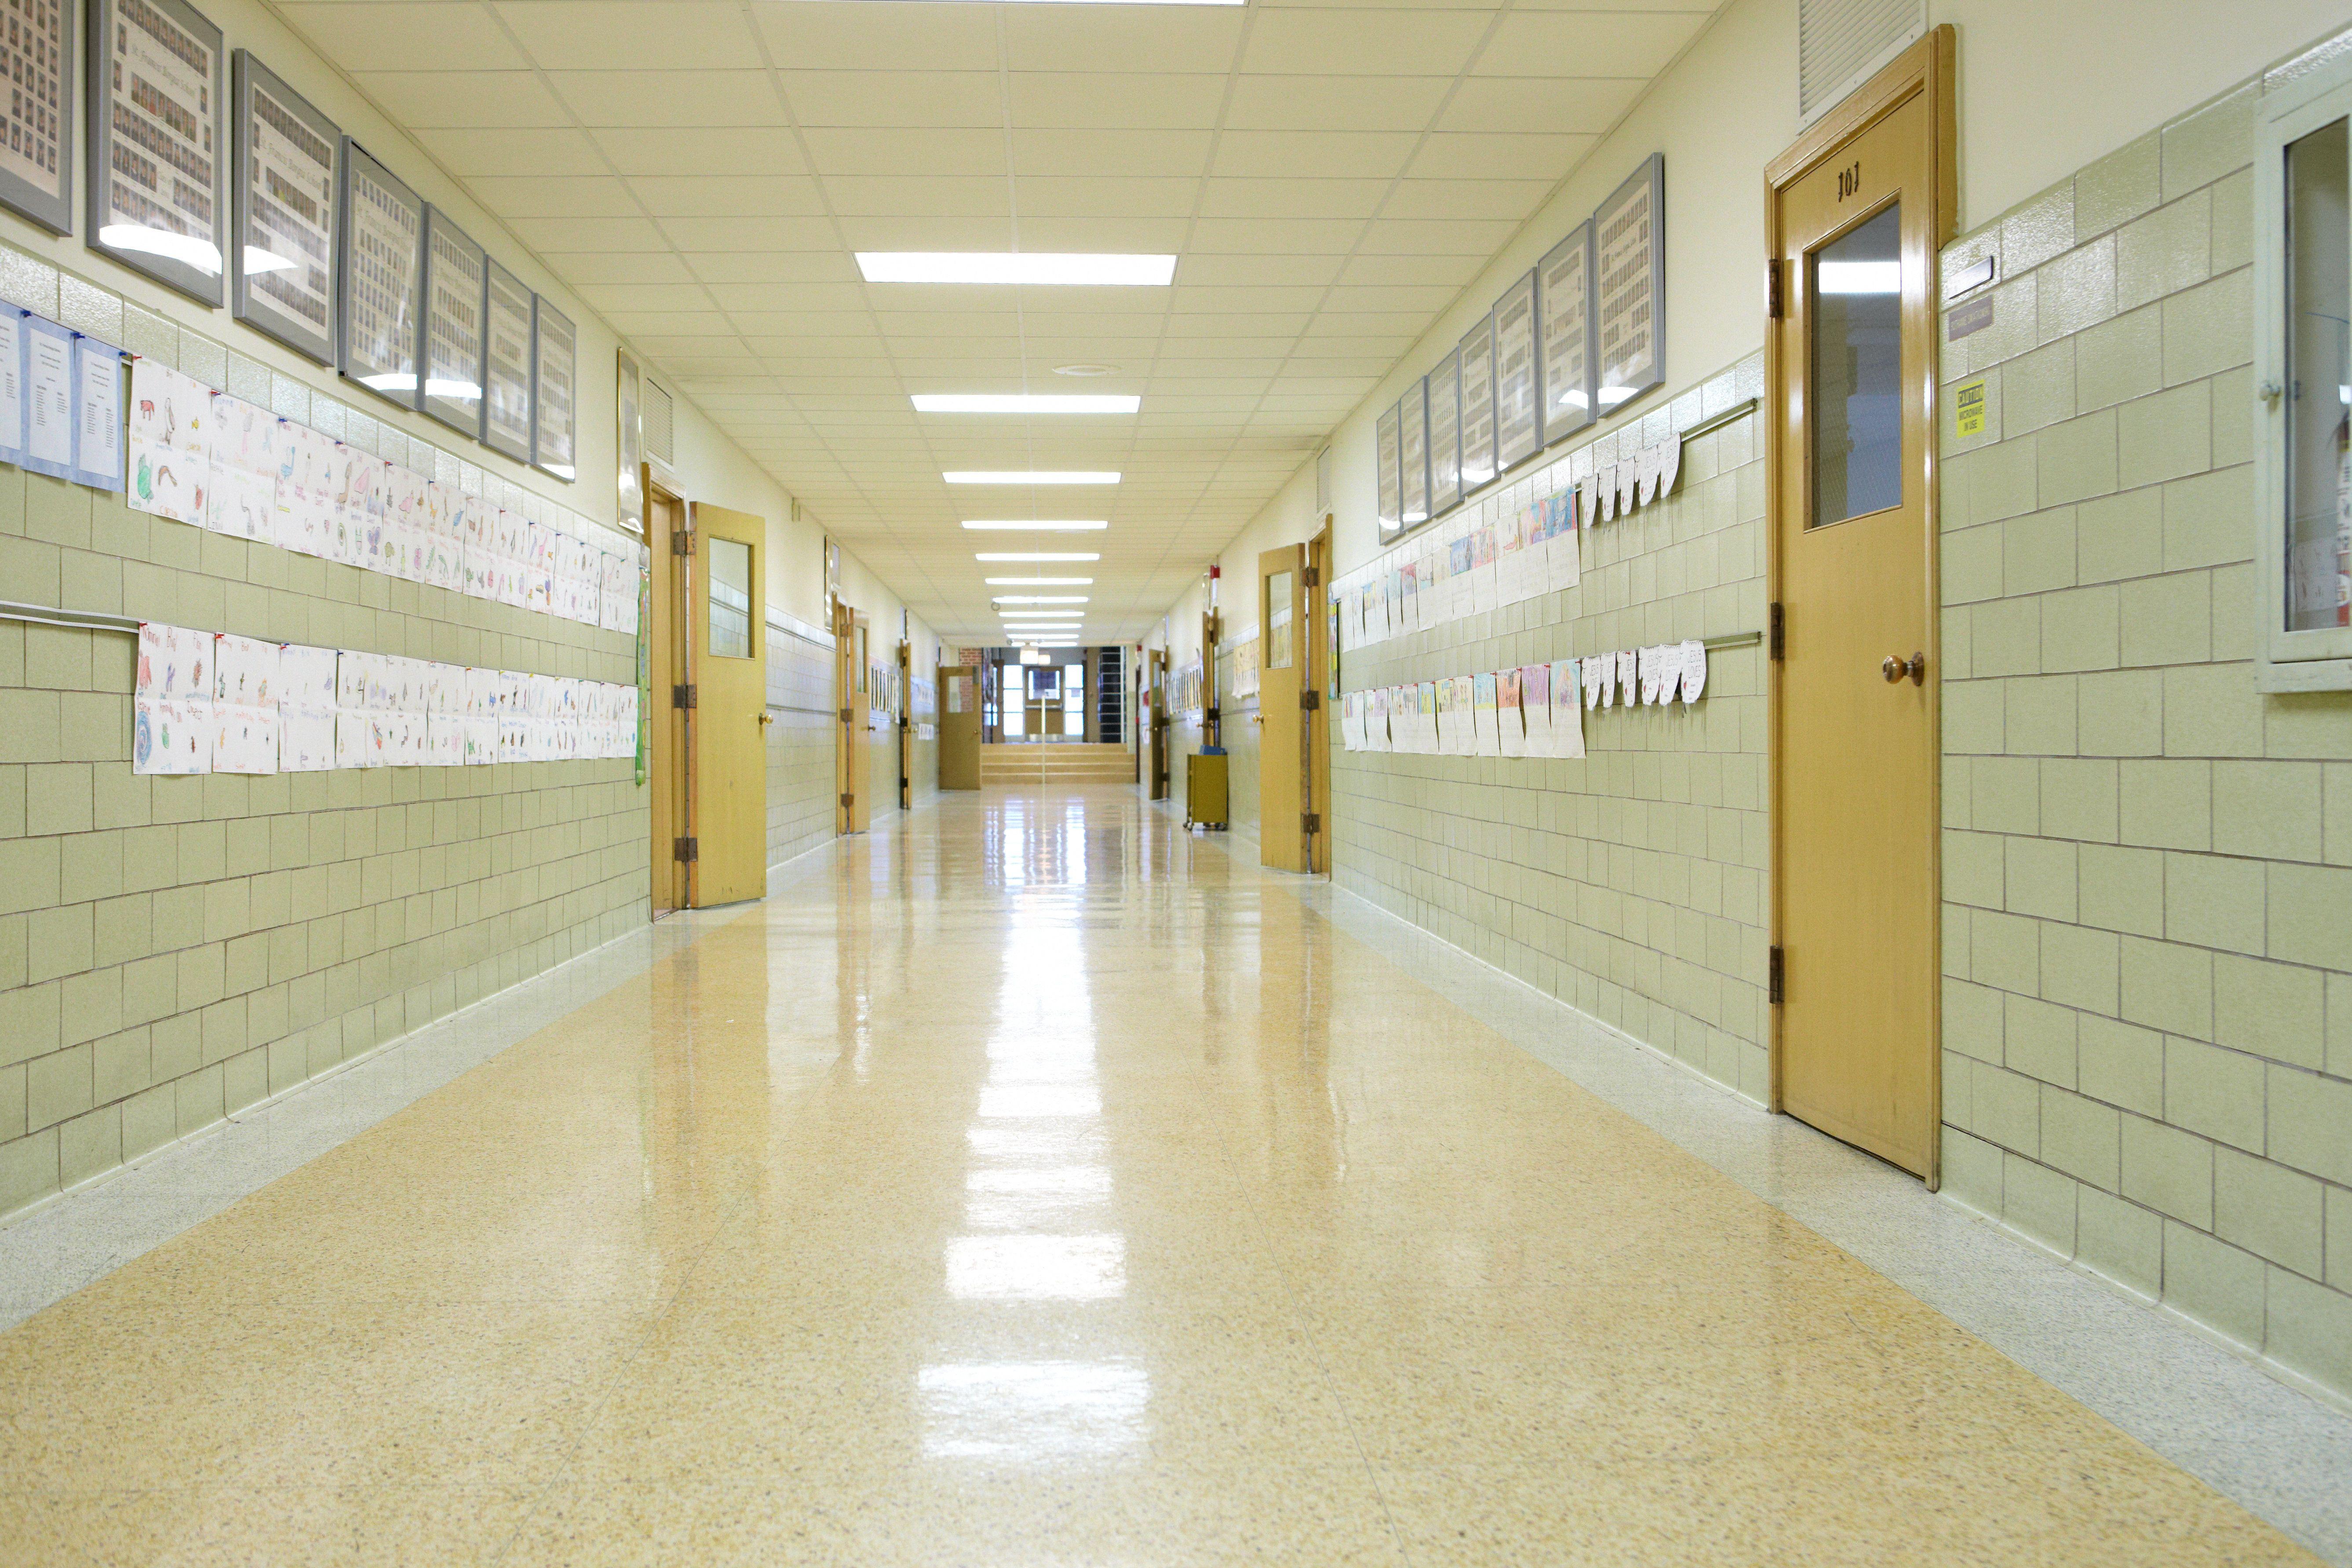 school hallway | School hallways, Hallway, Student clipart